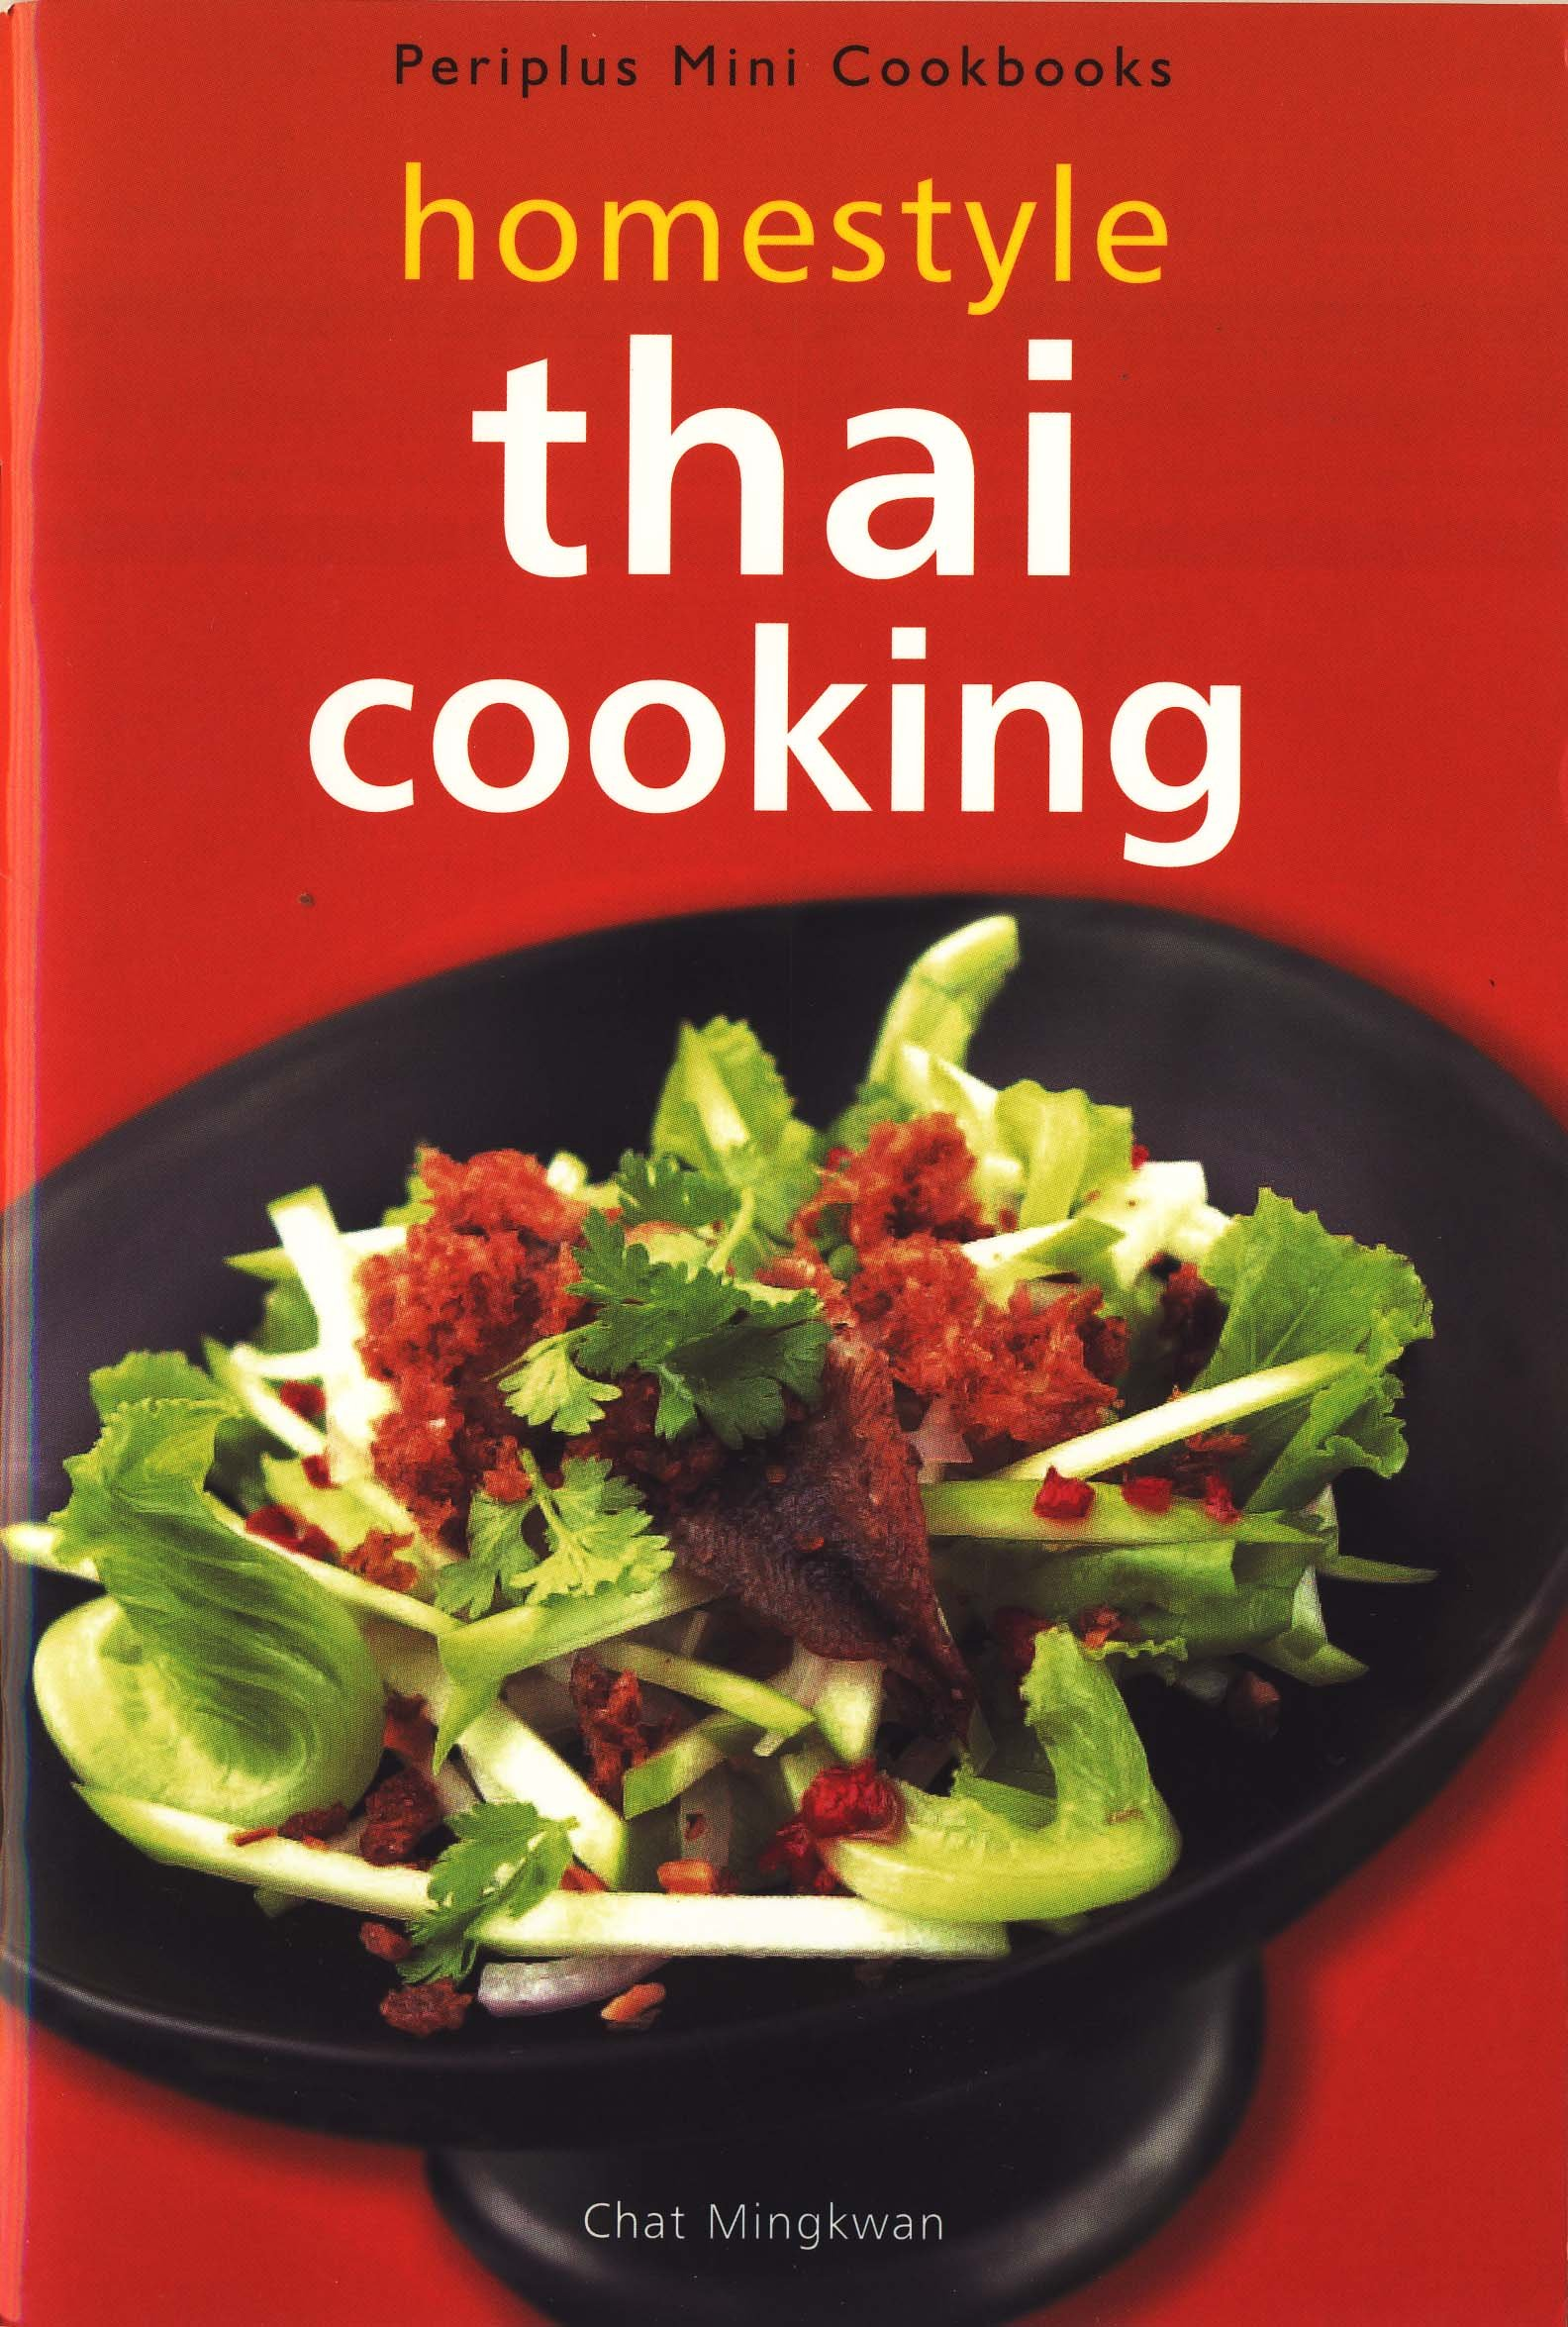 Read Online Periplus Mini Cookbooks: Homestyle Thai Cooking [Paperback] pdf epub